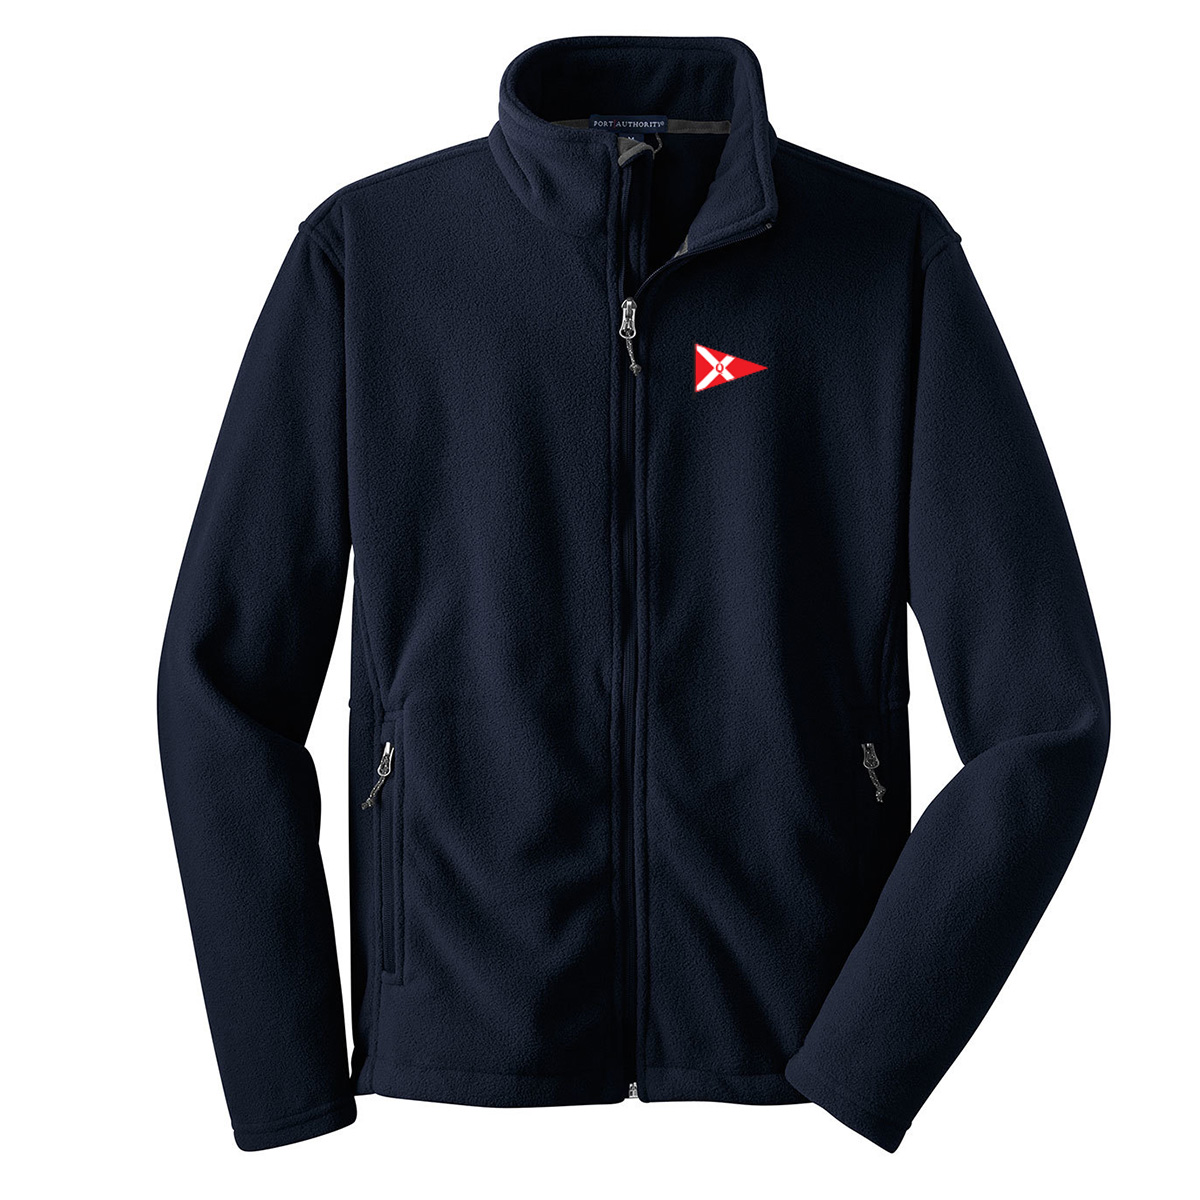 Quissett Yacht Club - Men's Value Fleece Jacket